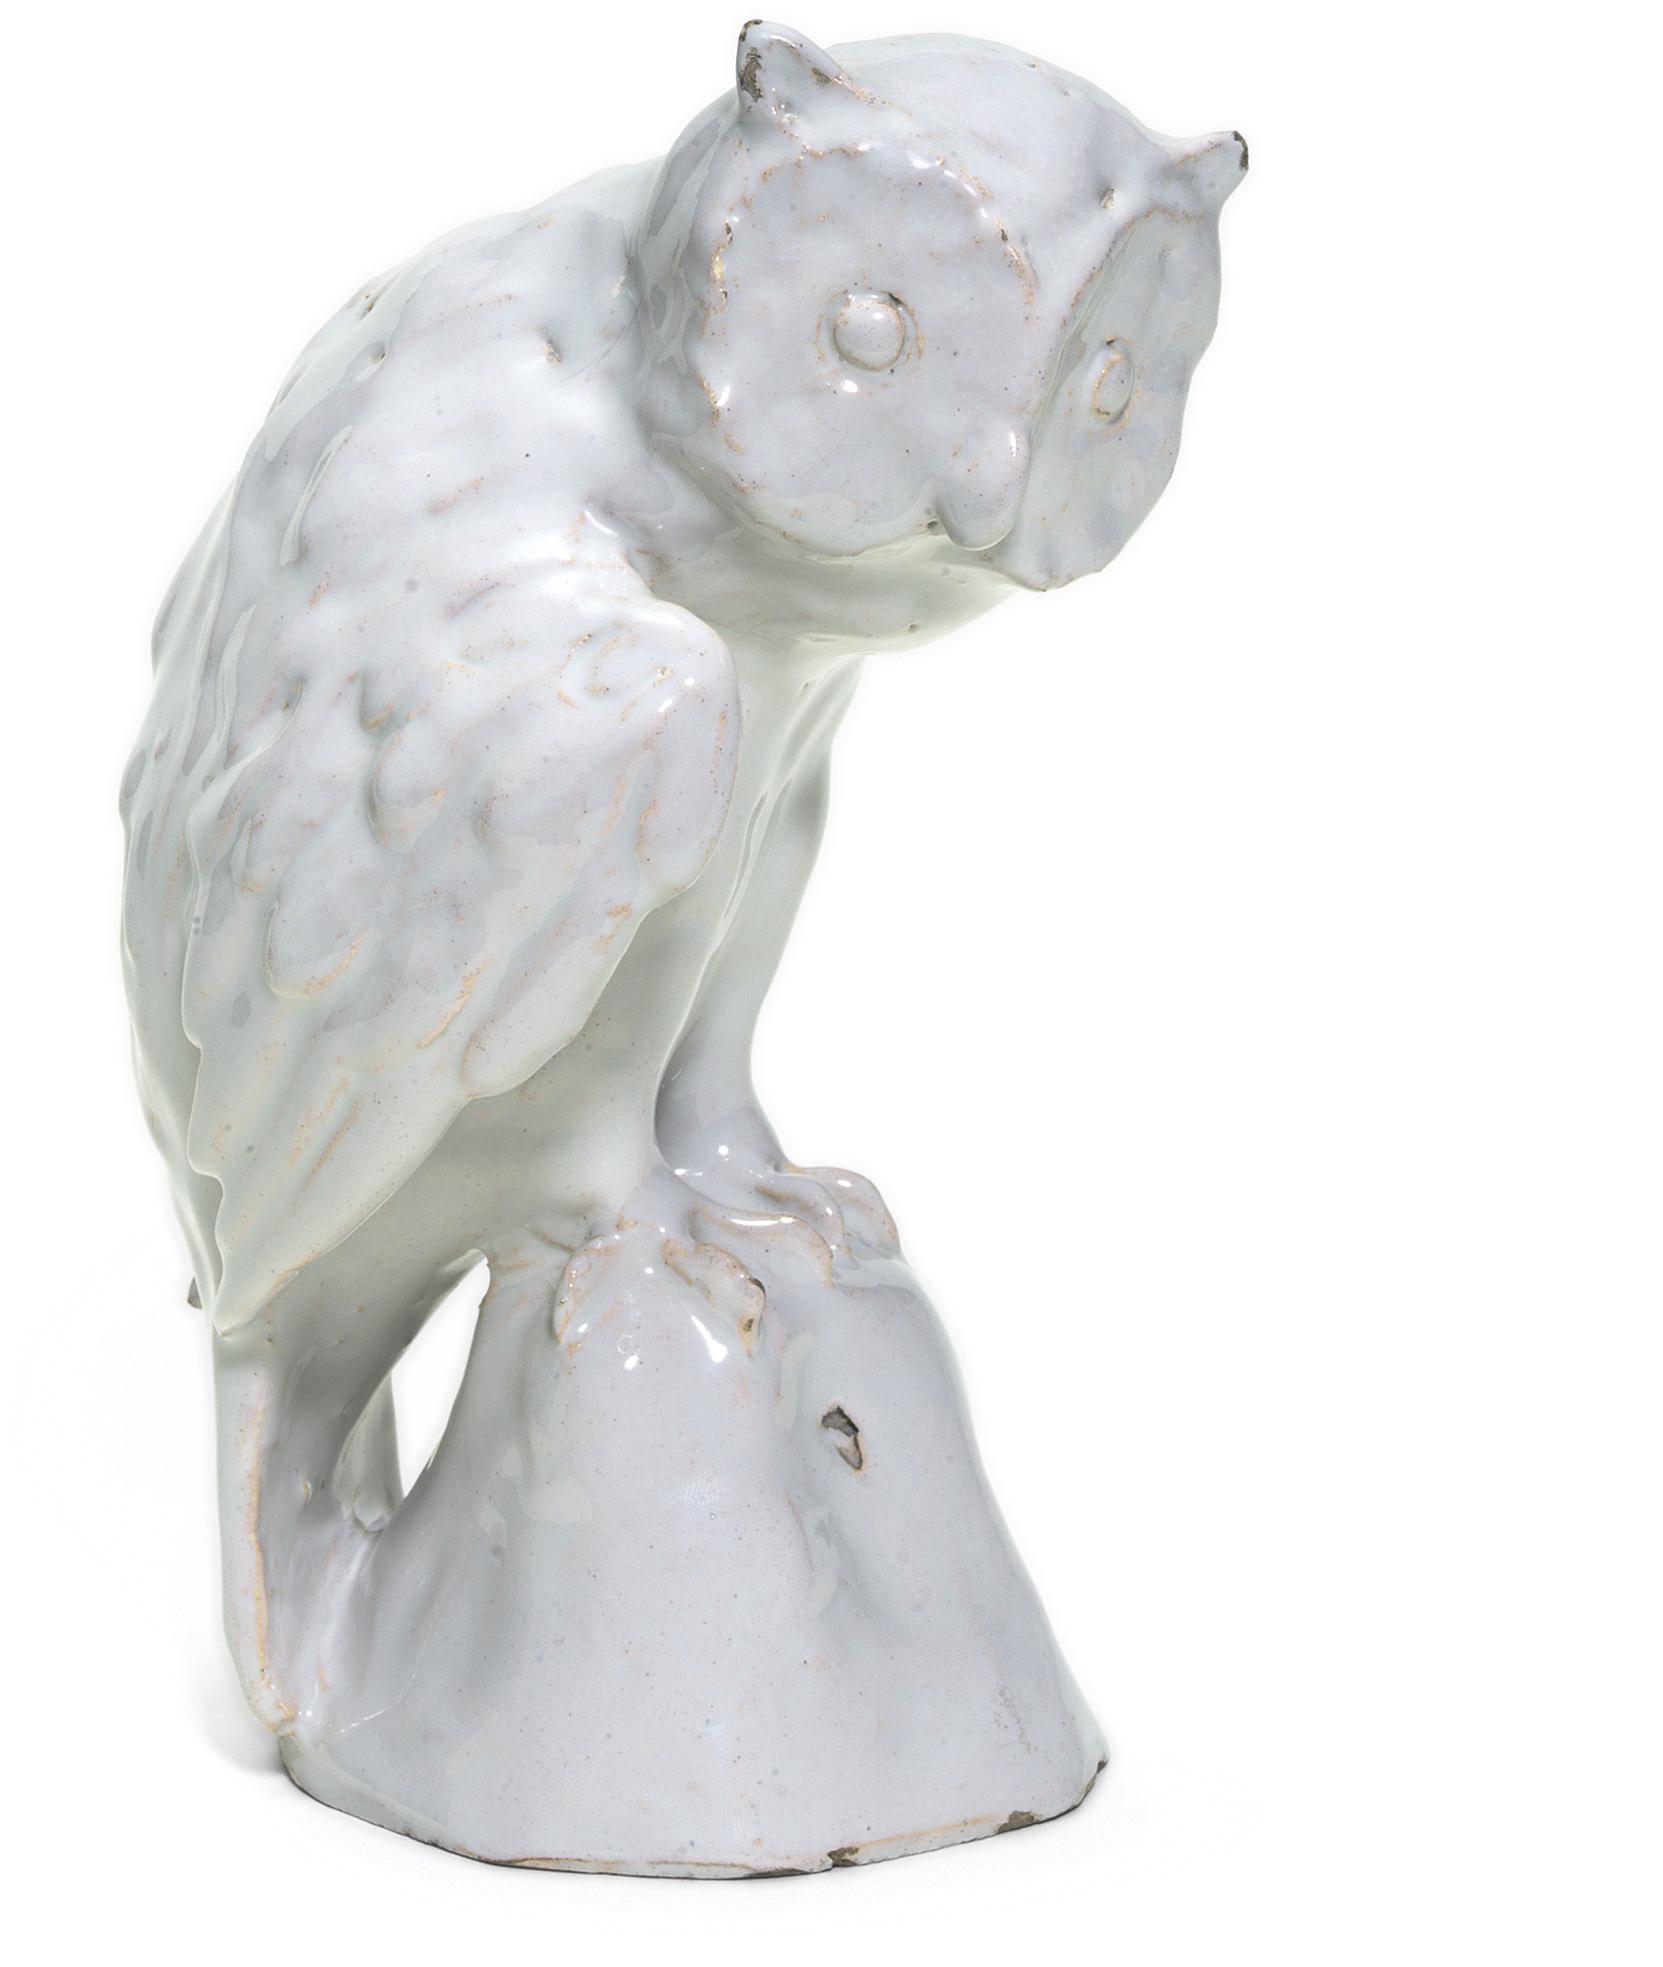 A TIN-GLAZED WHITE MODEL OF A